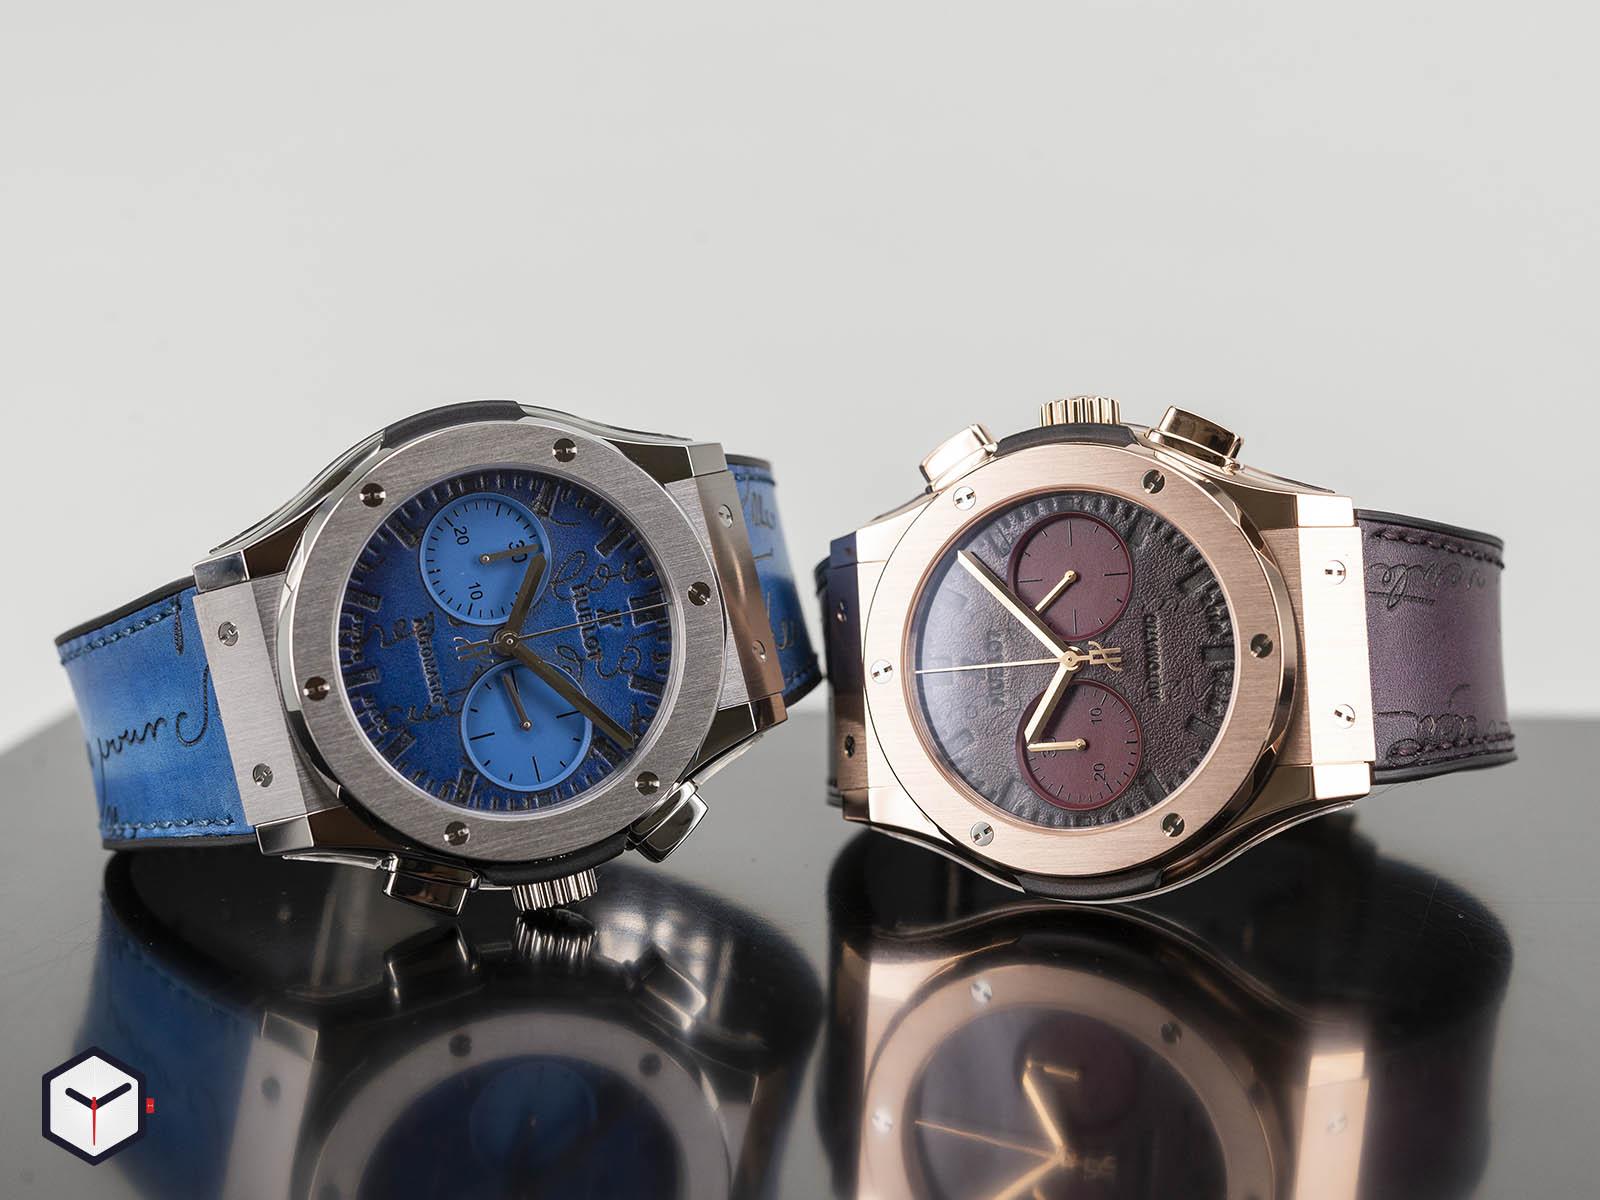 521-nx-050b-vr-ber18-hublot-classic-fusion-chronograph-berluti-scritto-ocean-blue-45mm-4.jpg